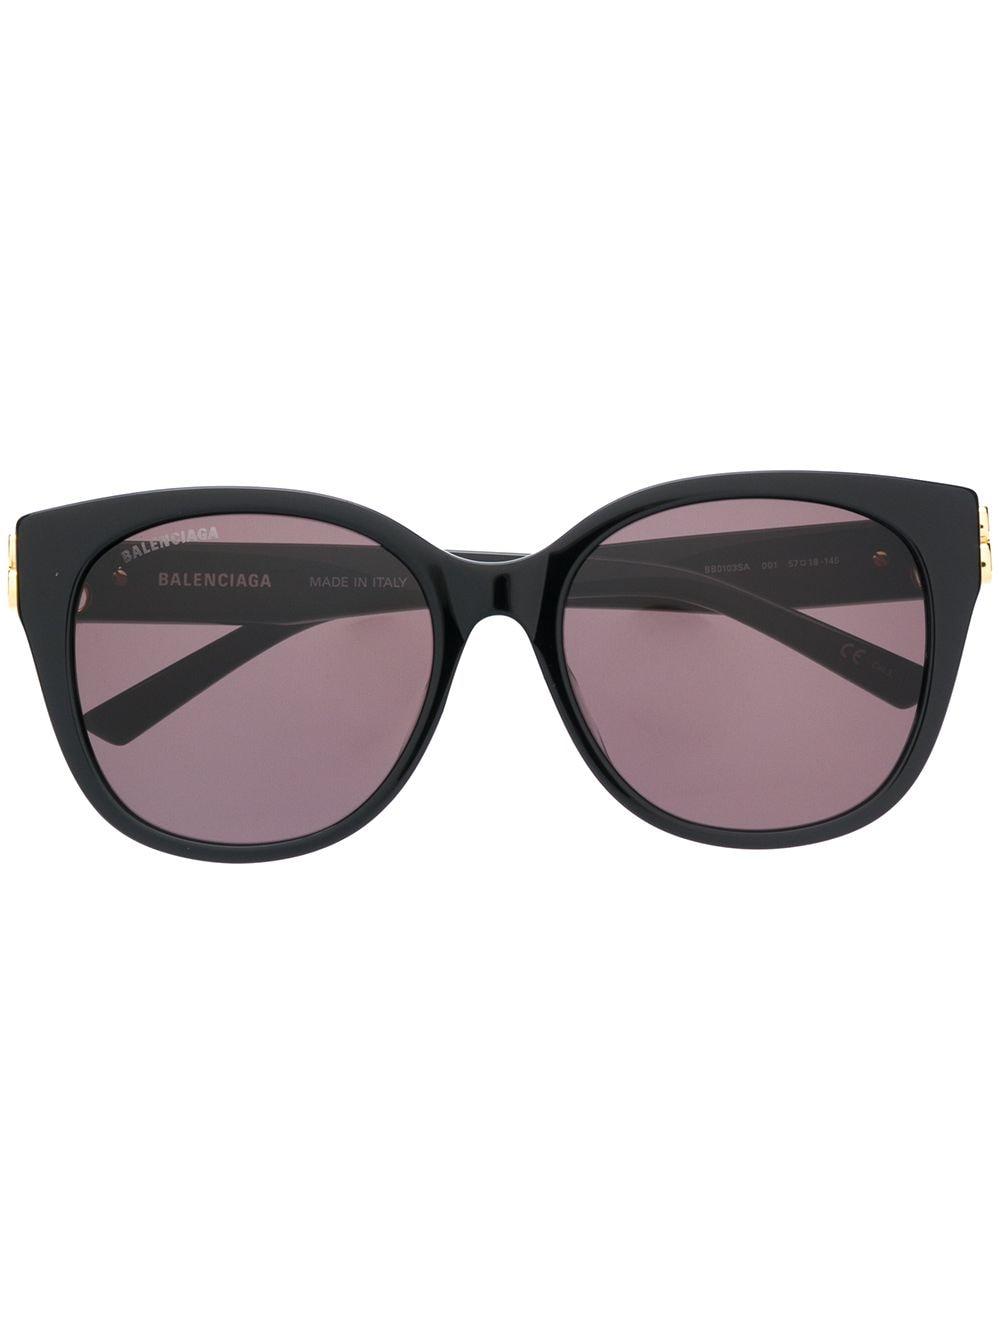 Dynasty Sunglasses